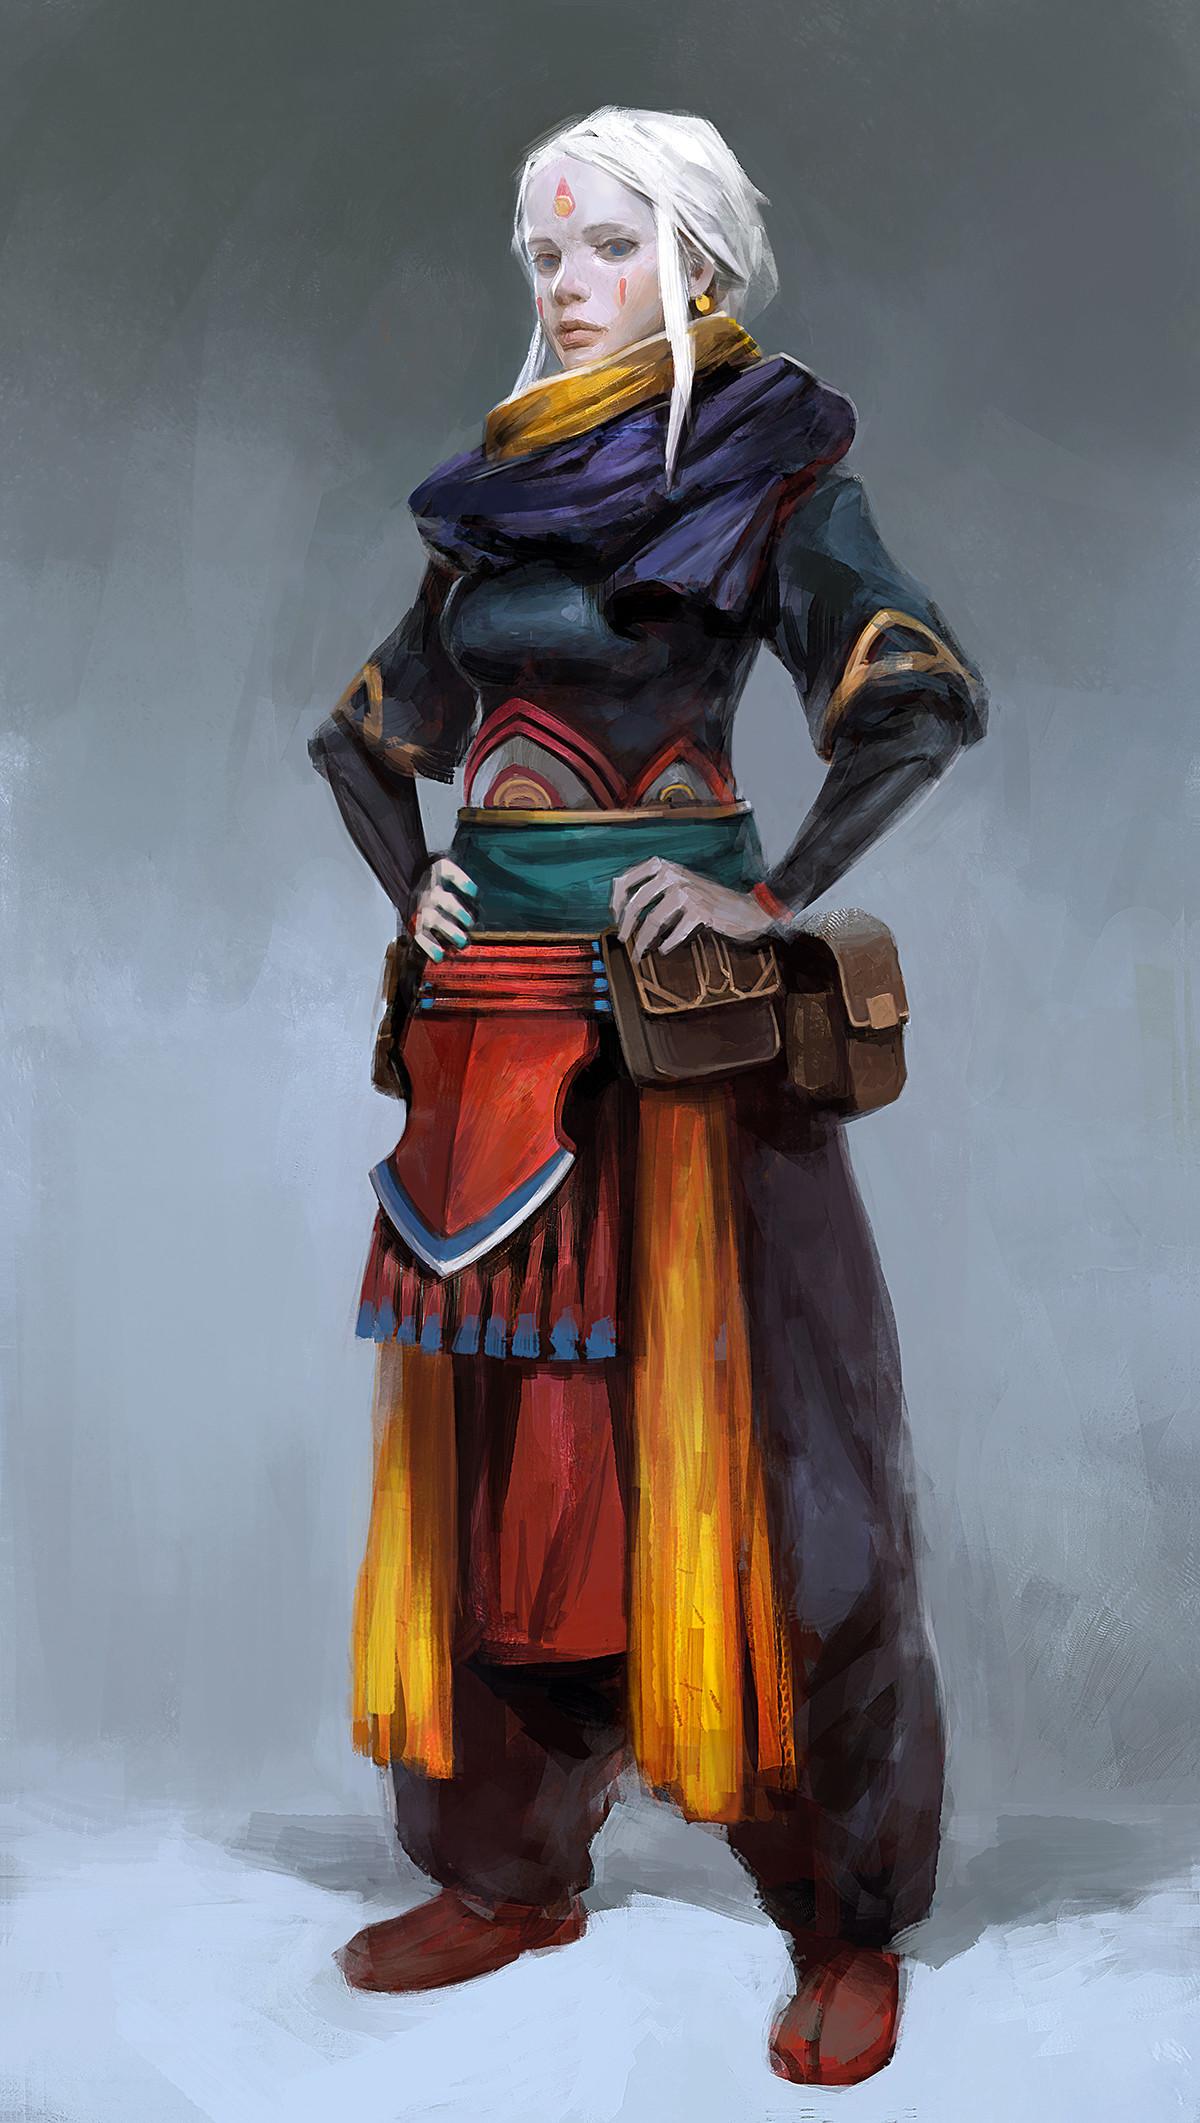 Yuan cui female villager preview